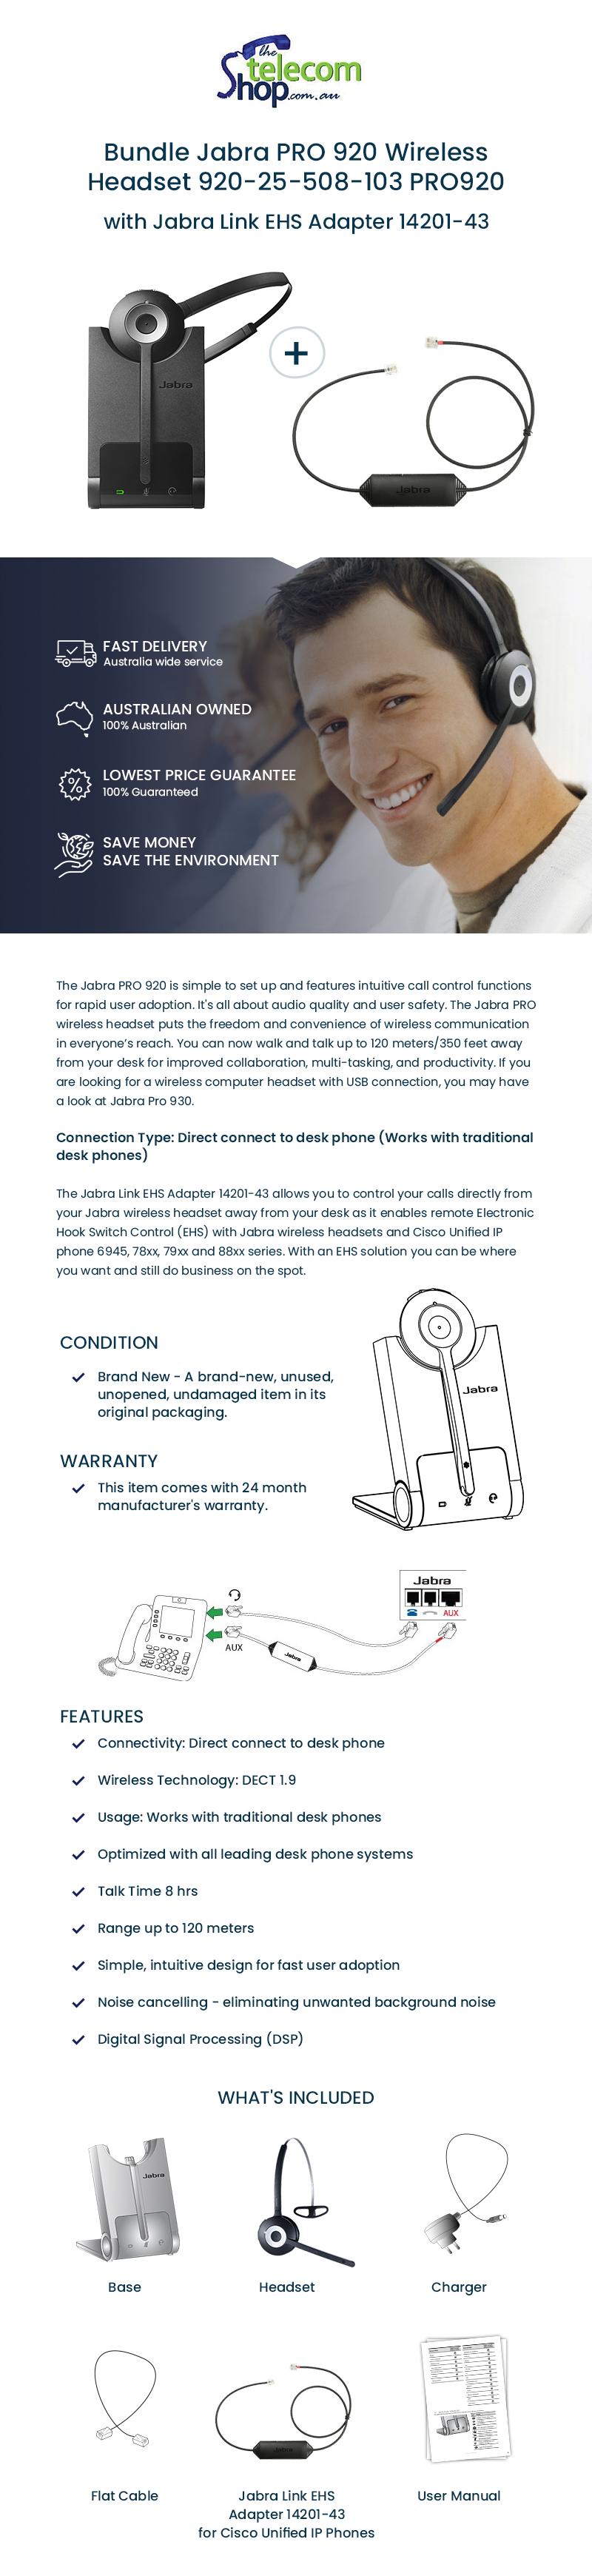 Buy Jabra Pro 920 Wireless Headset with Jabra Link EHS Adapter from The Telecom Shop PTY Ltd